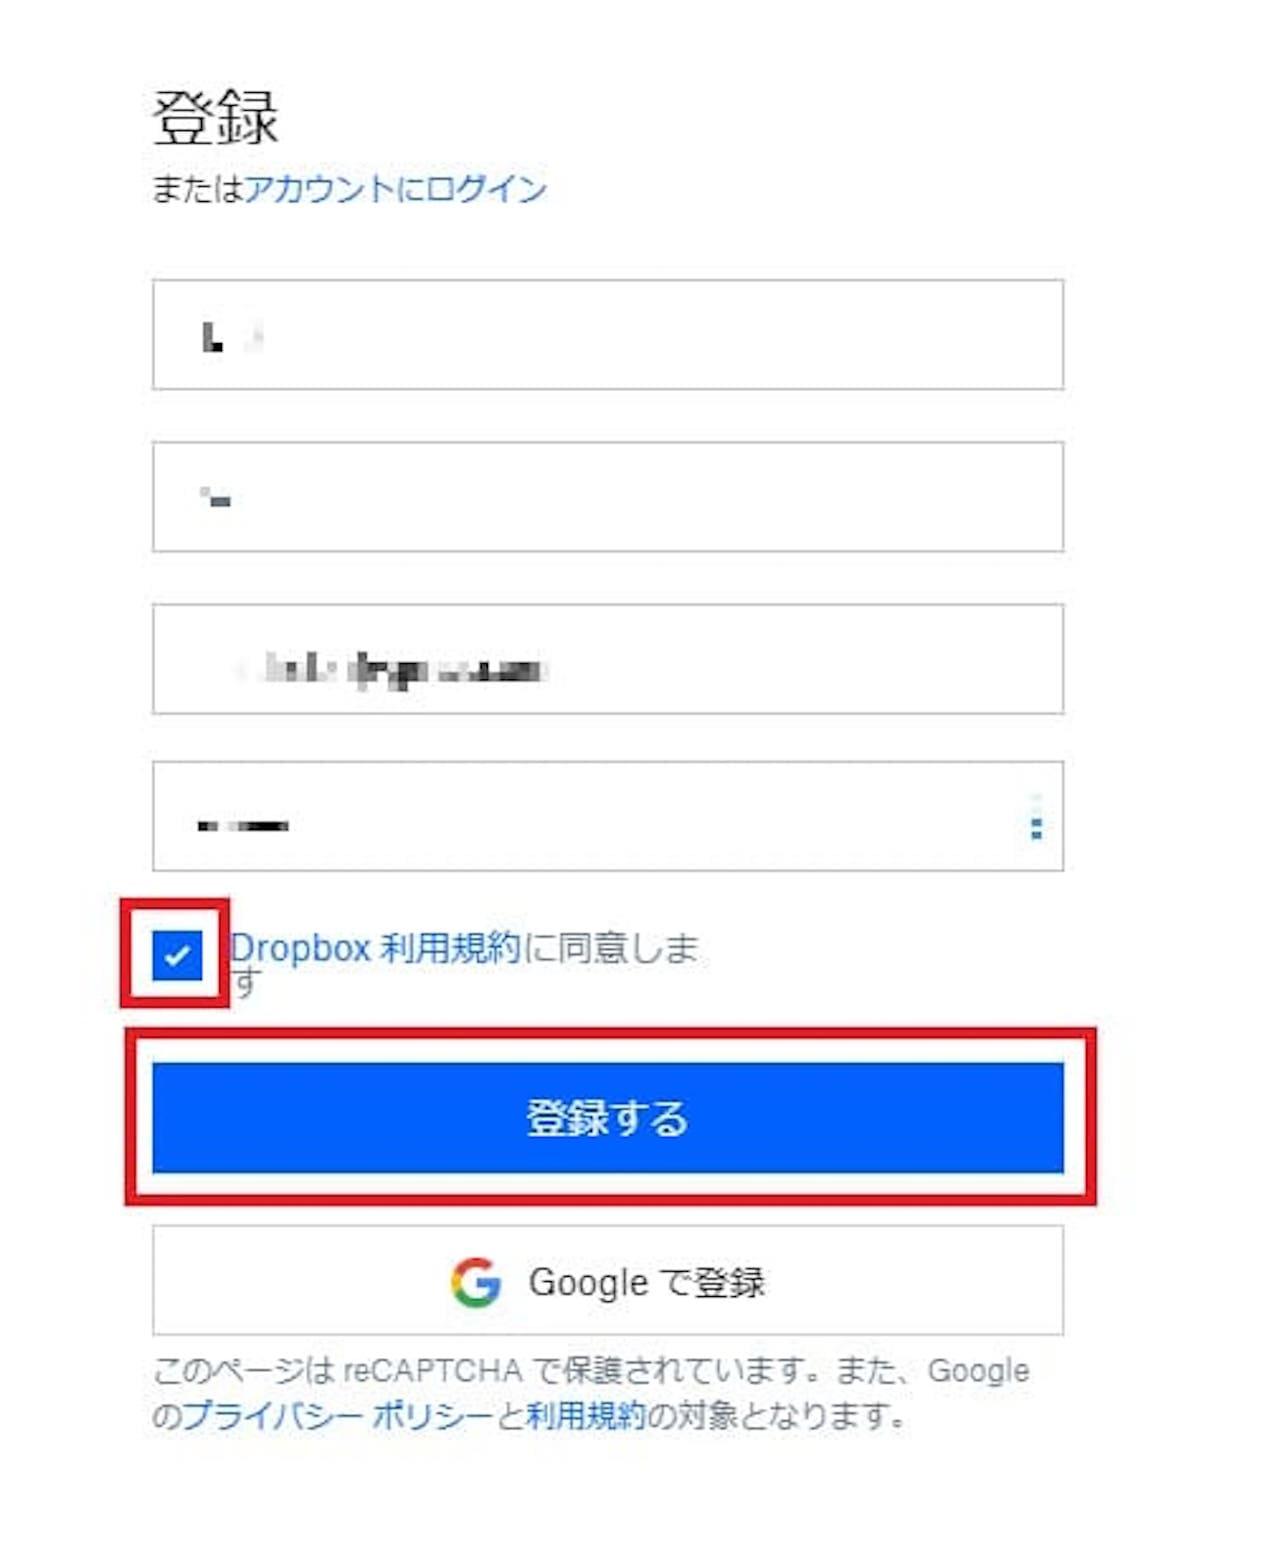 Dropboxのアカウント登録方法②